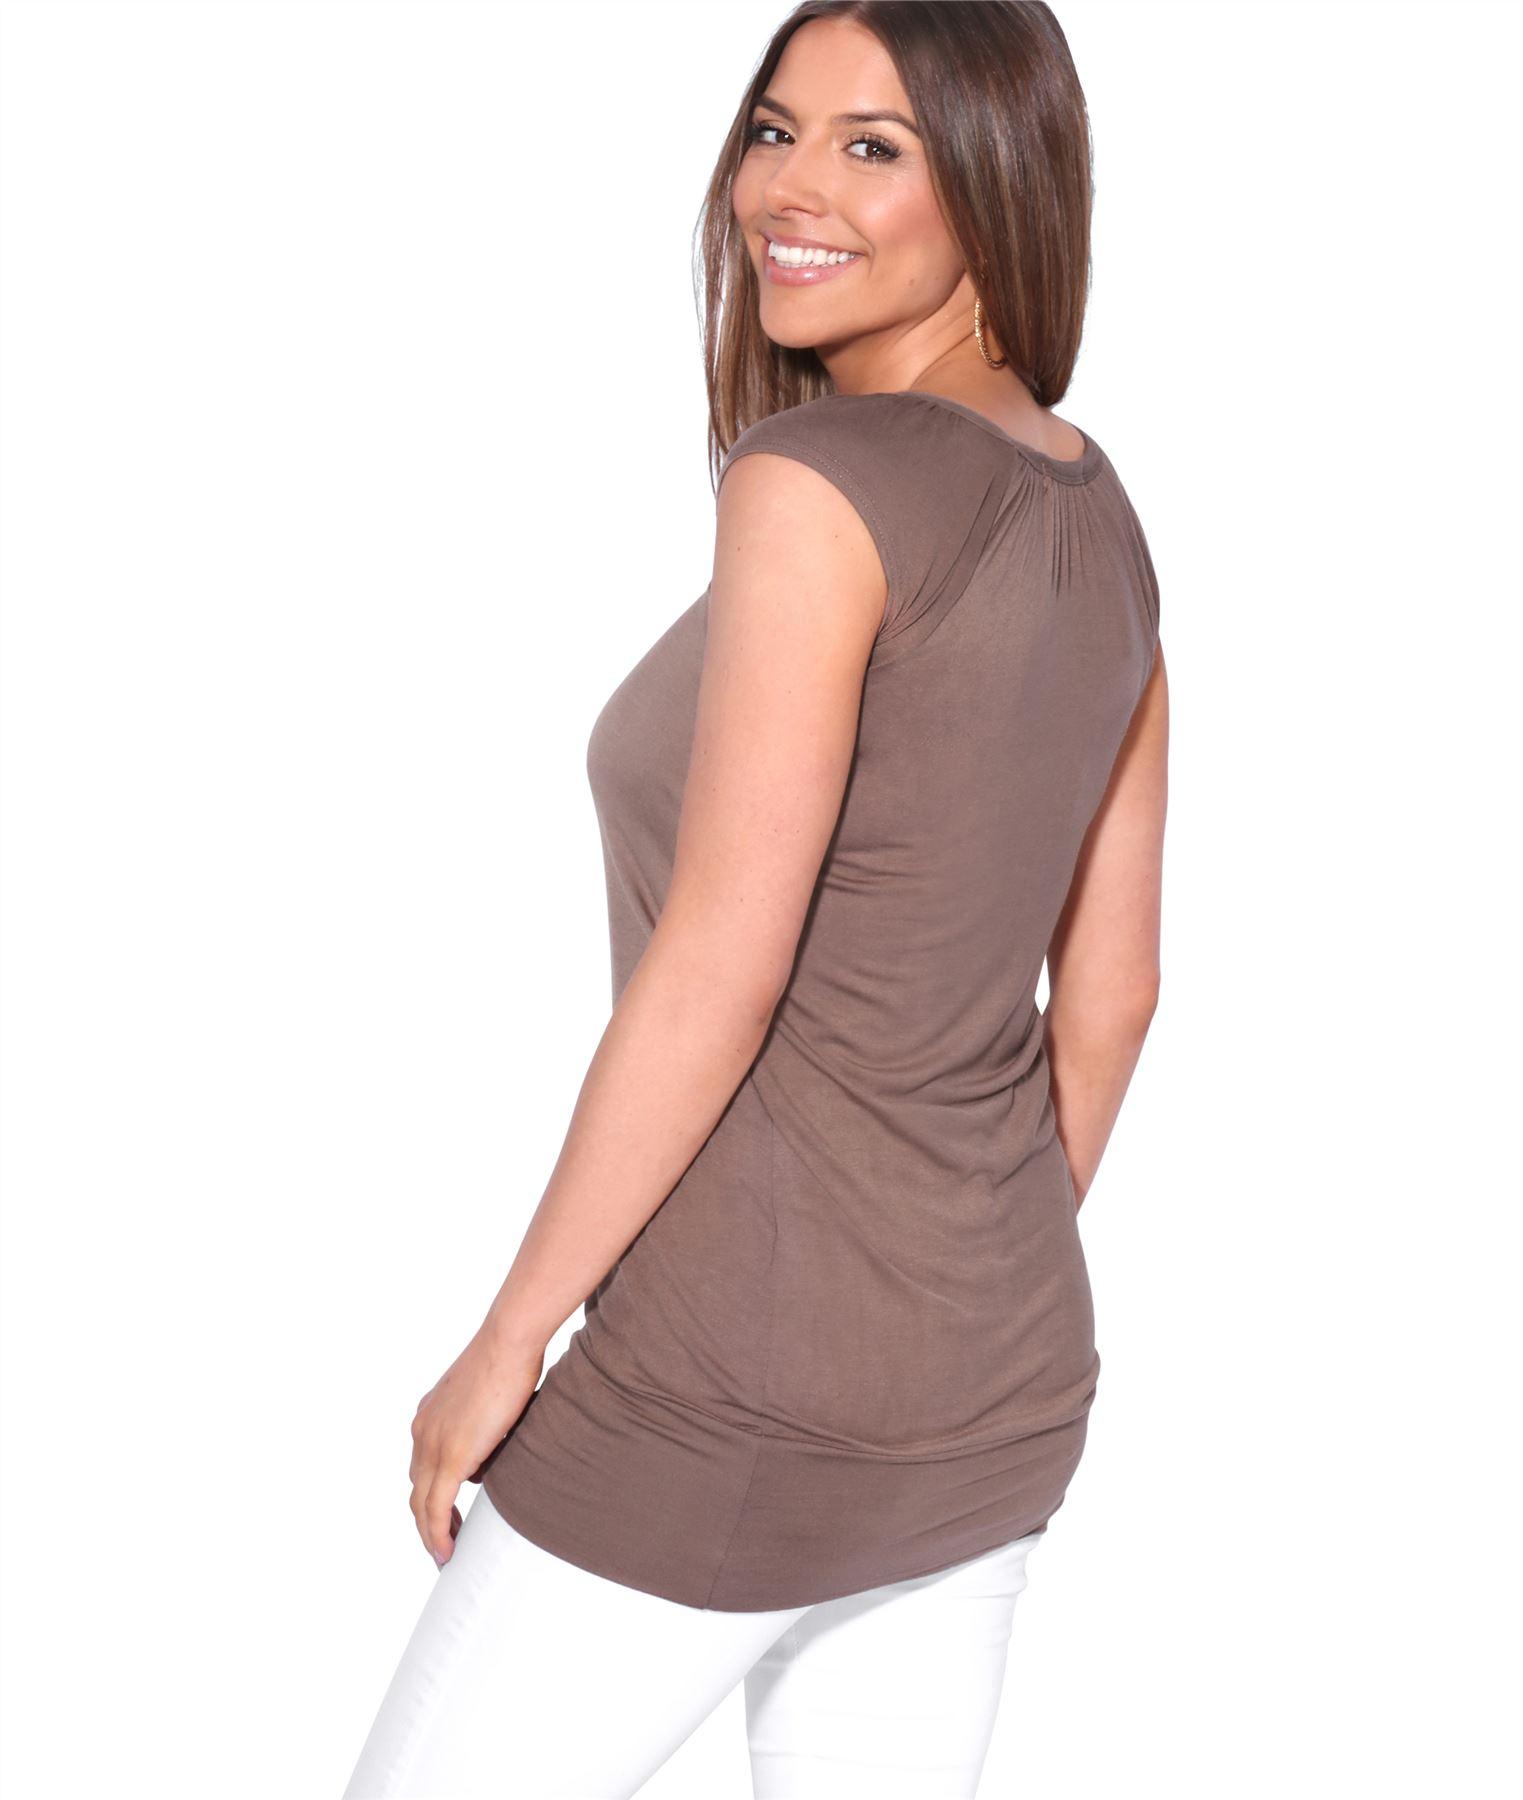 Womens-Ladies-Scoop-Neck-Blouse-V-T-Shirt-Long-Short-Sleeve-Plain-Loose-Top thumbnail 28